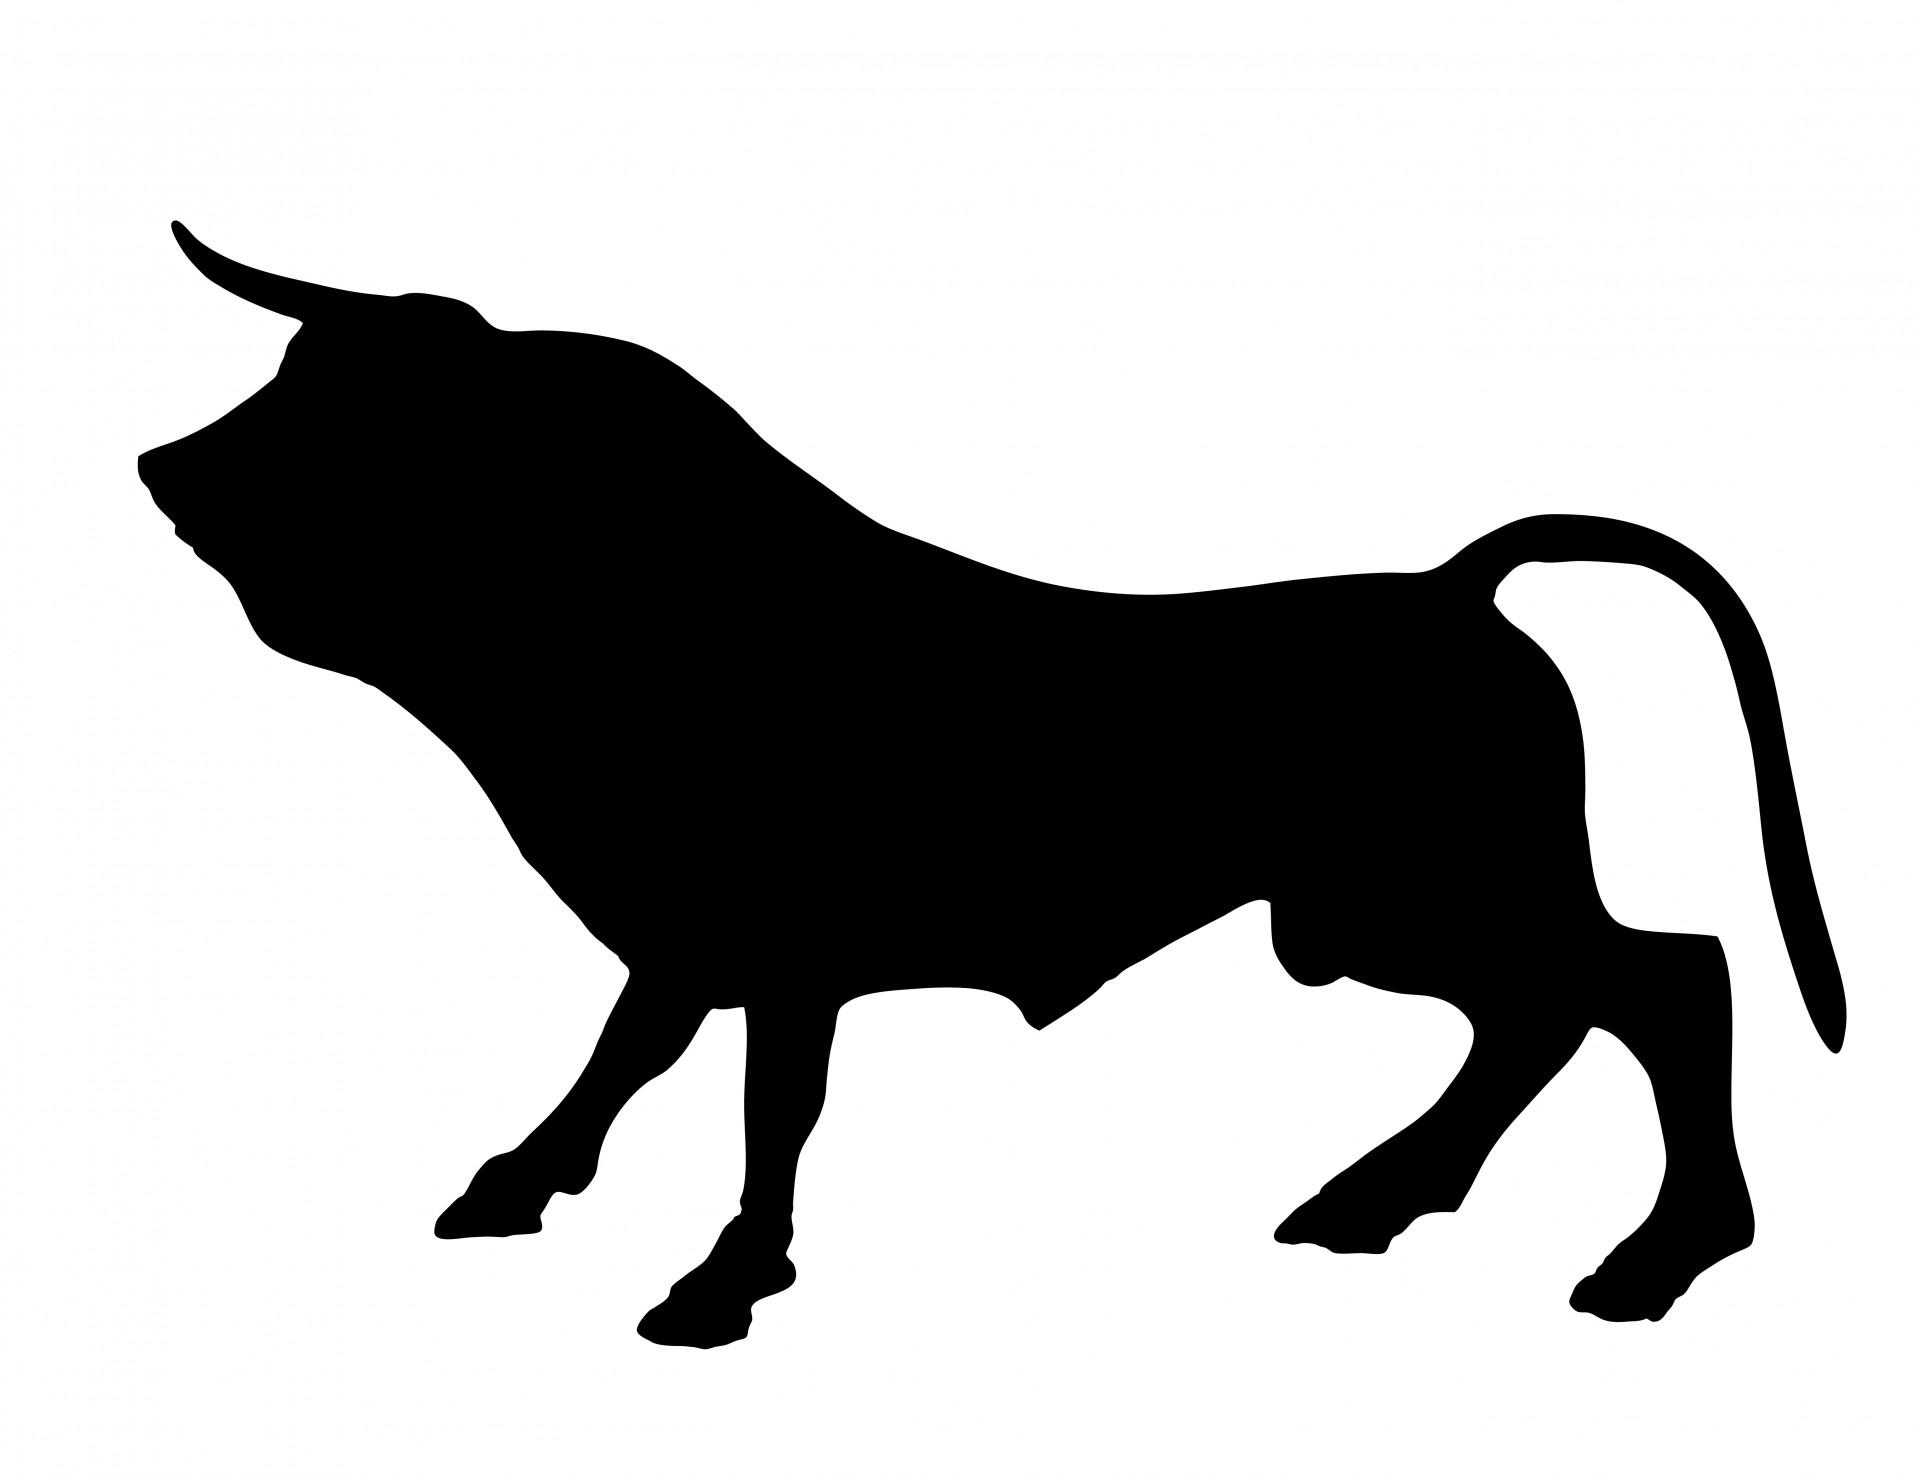 Bull clipart silhouette. Free stock photo public